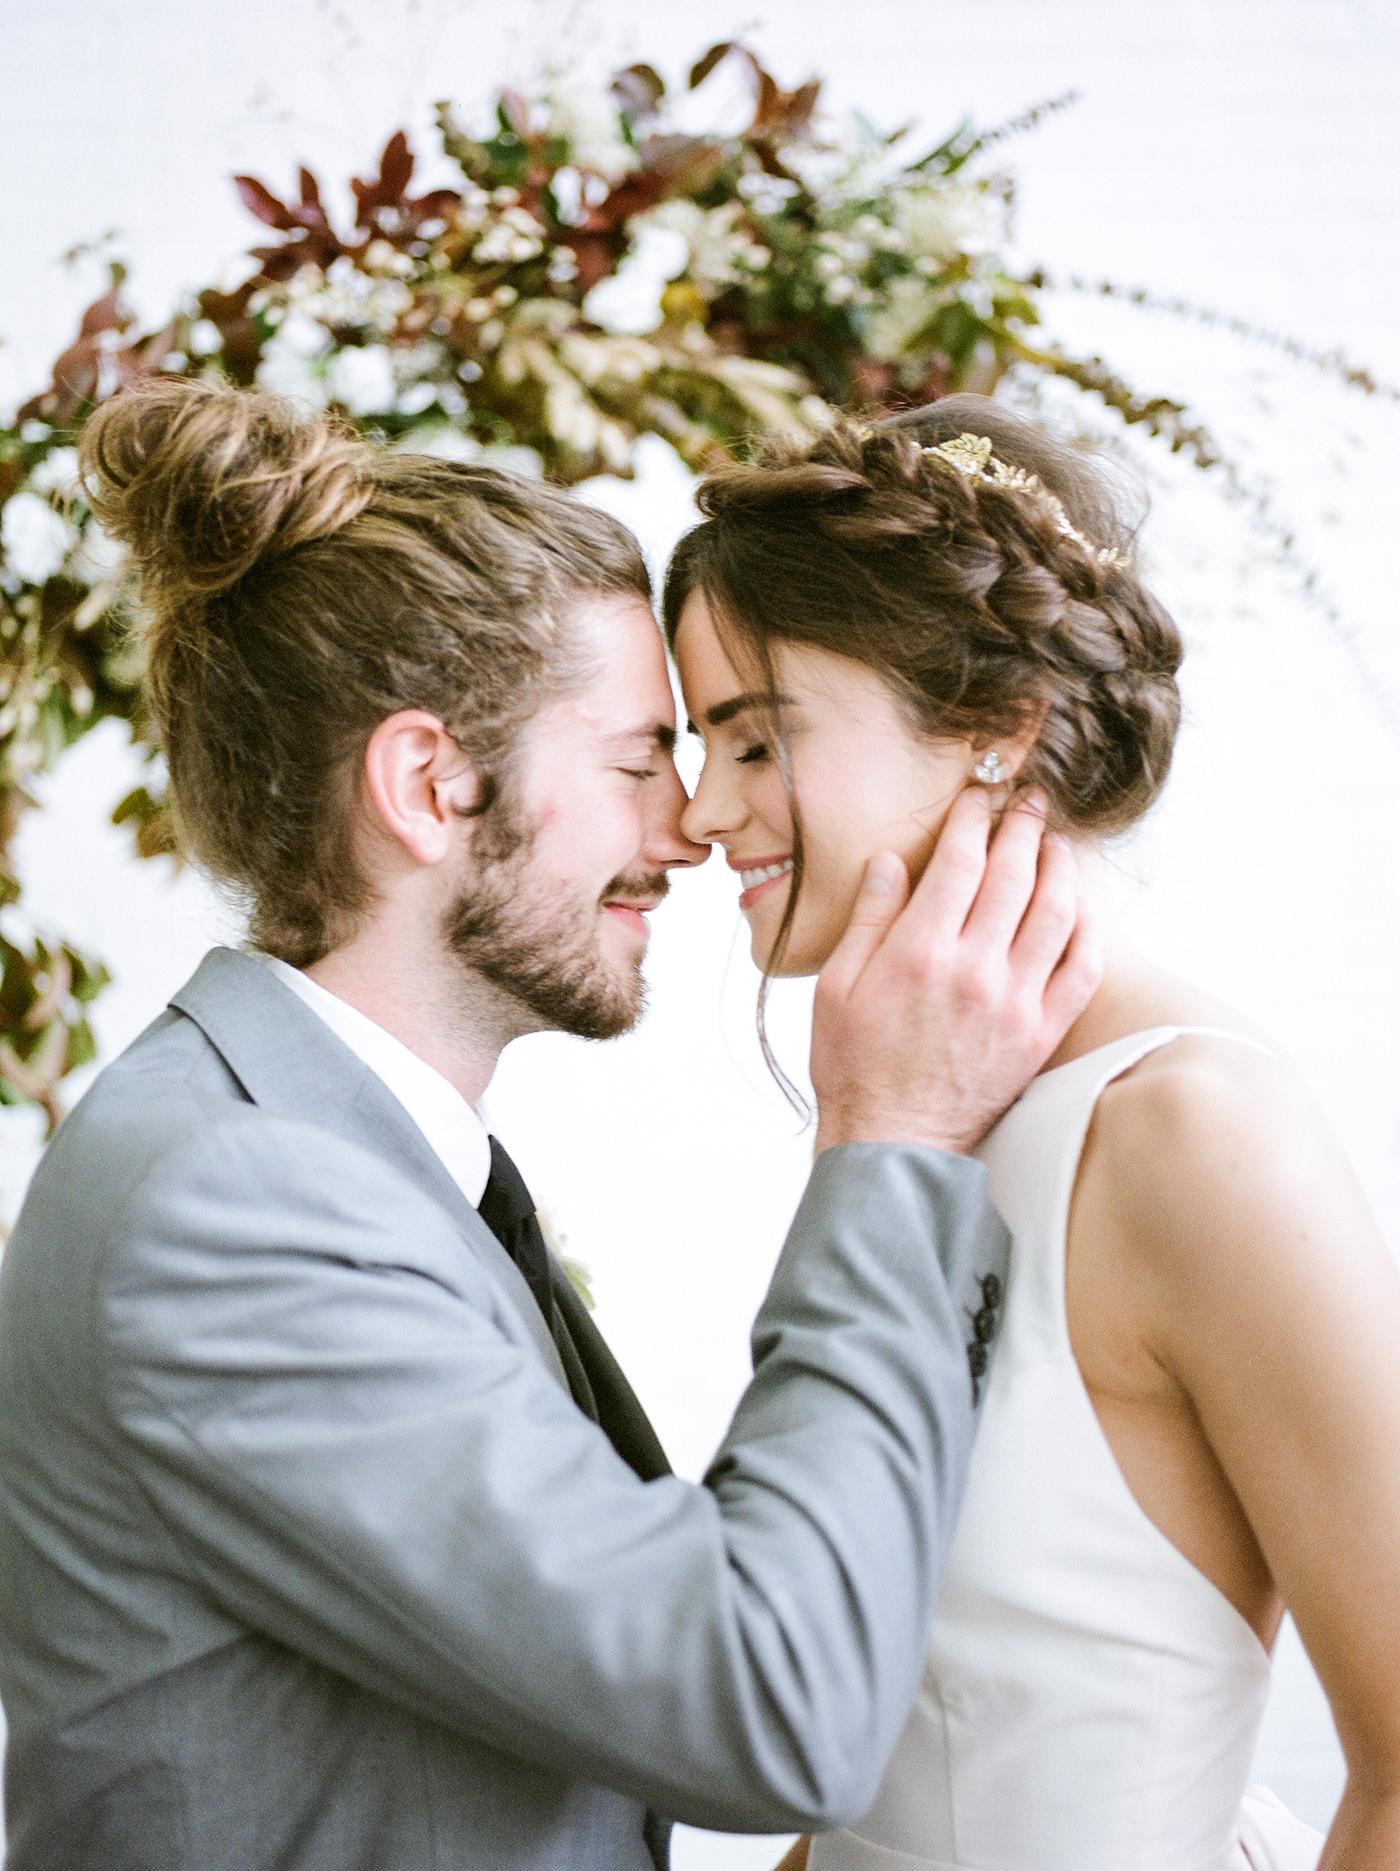 Wedding Floral Design Dallas - Olive Grove Design - Mimimalist Fall Wedding - 00027.jpg